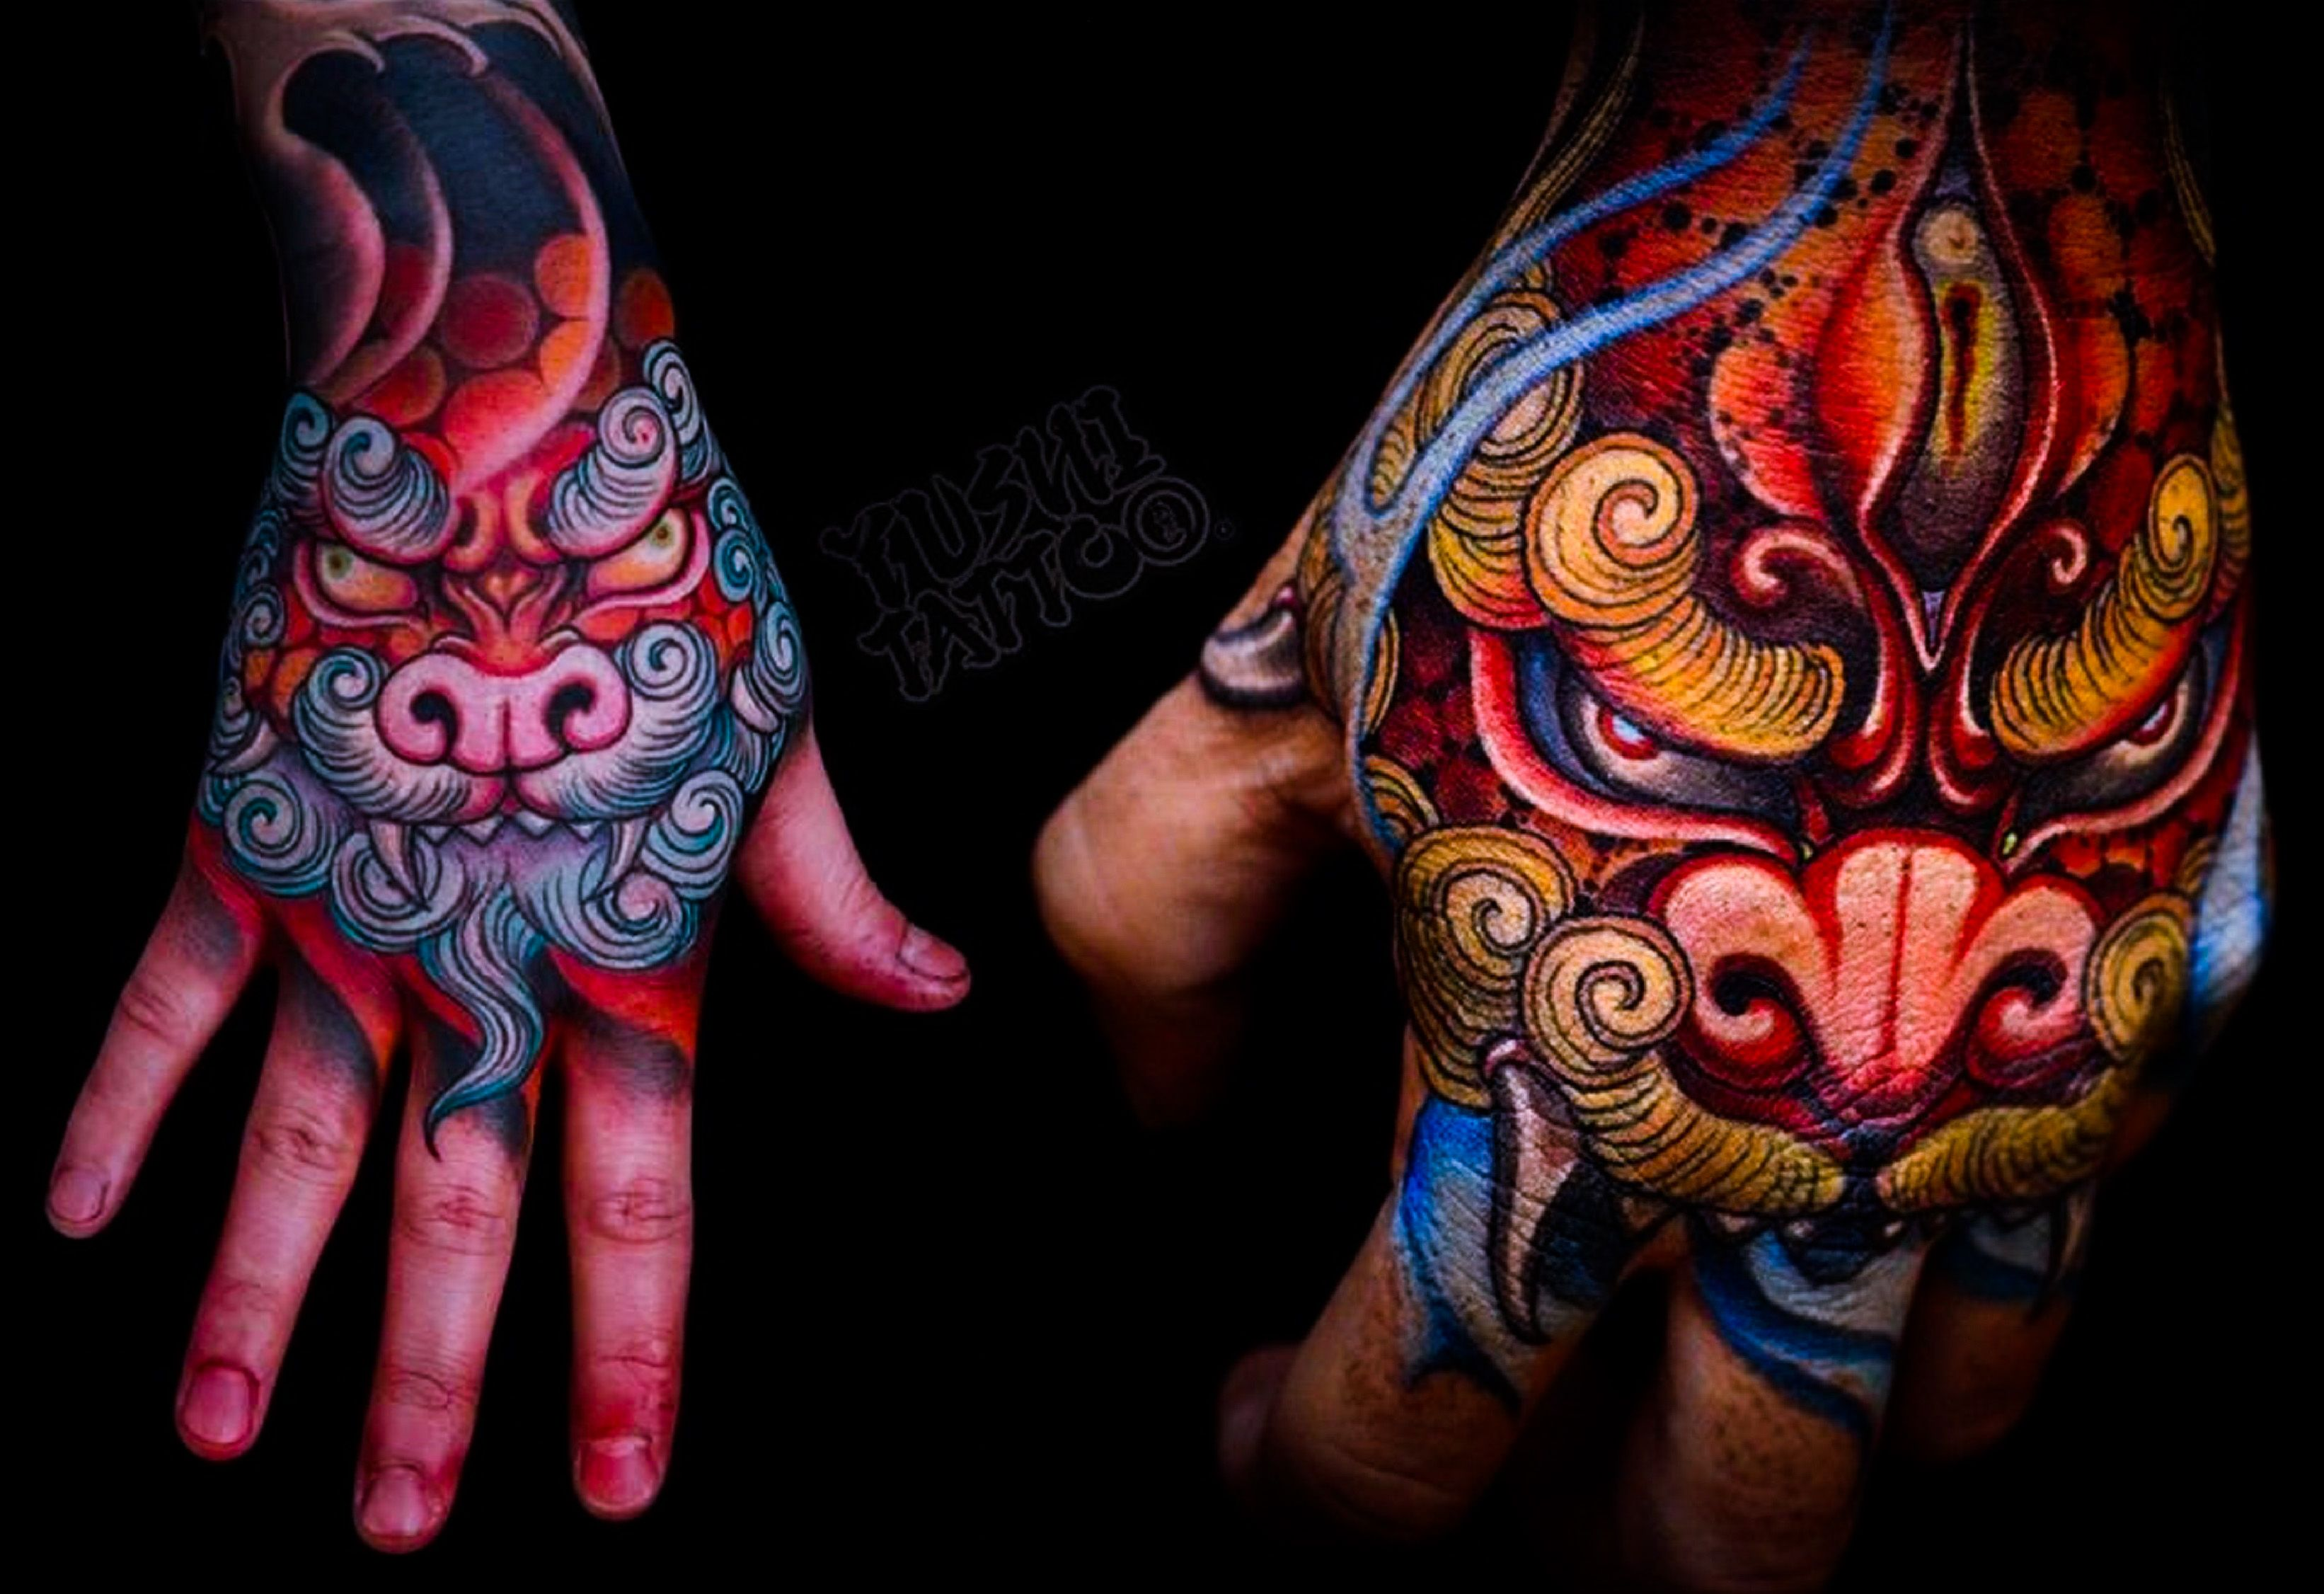 Tattoo Done By Yushi Tattooist Based In Seoul South Korea Japanese Hand Tattoos Badass Tattoos Tattoos